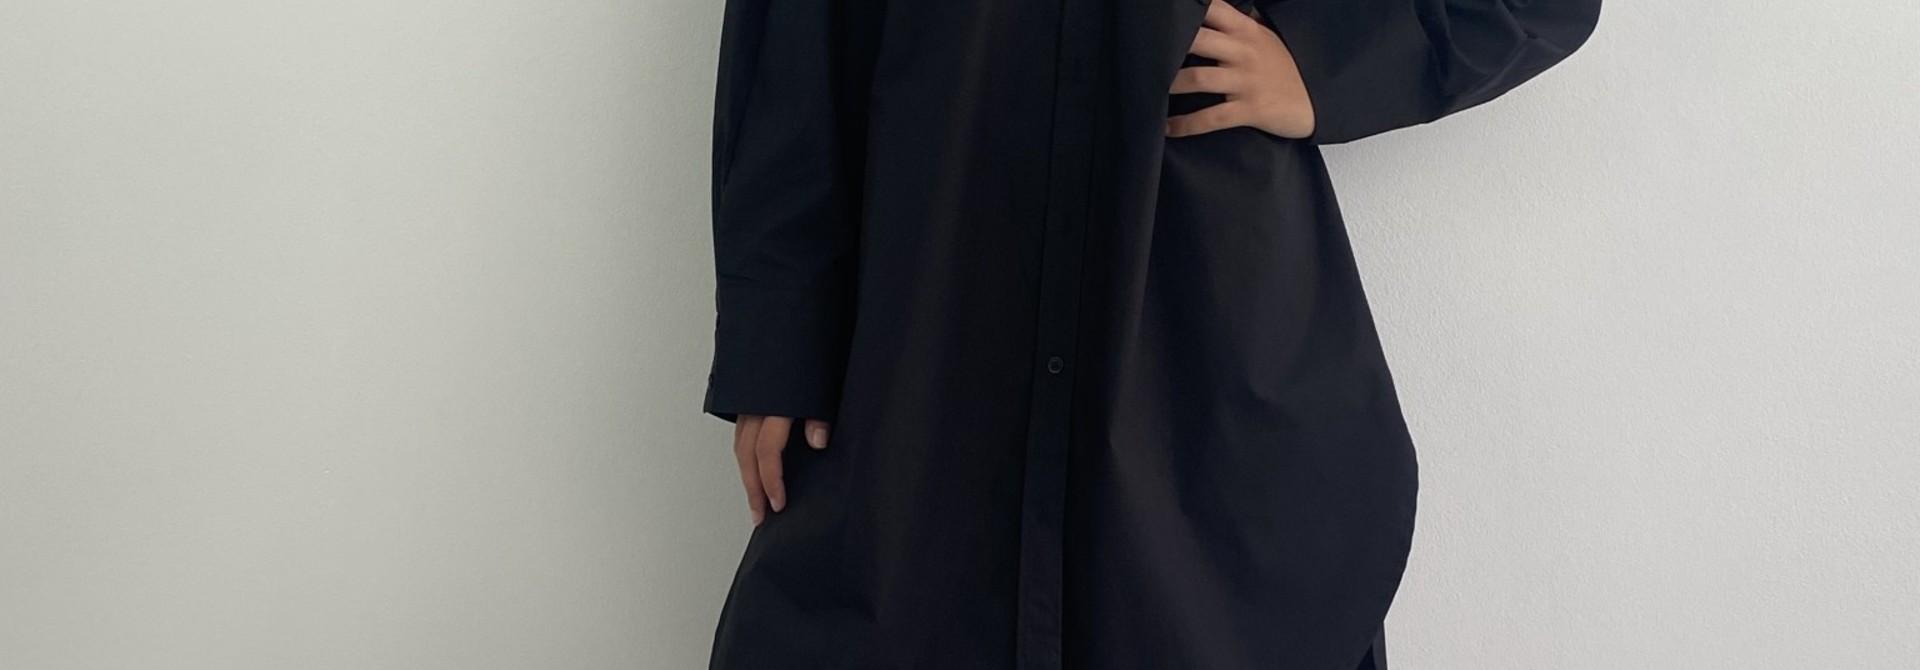 Andrea oversized shirt Black